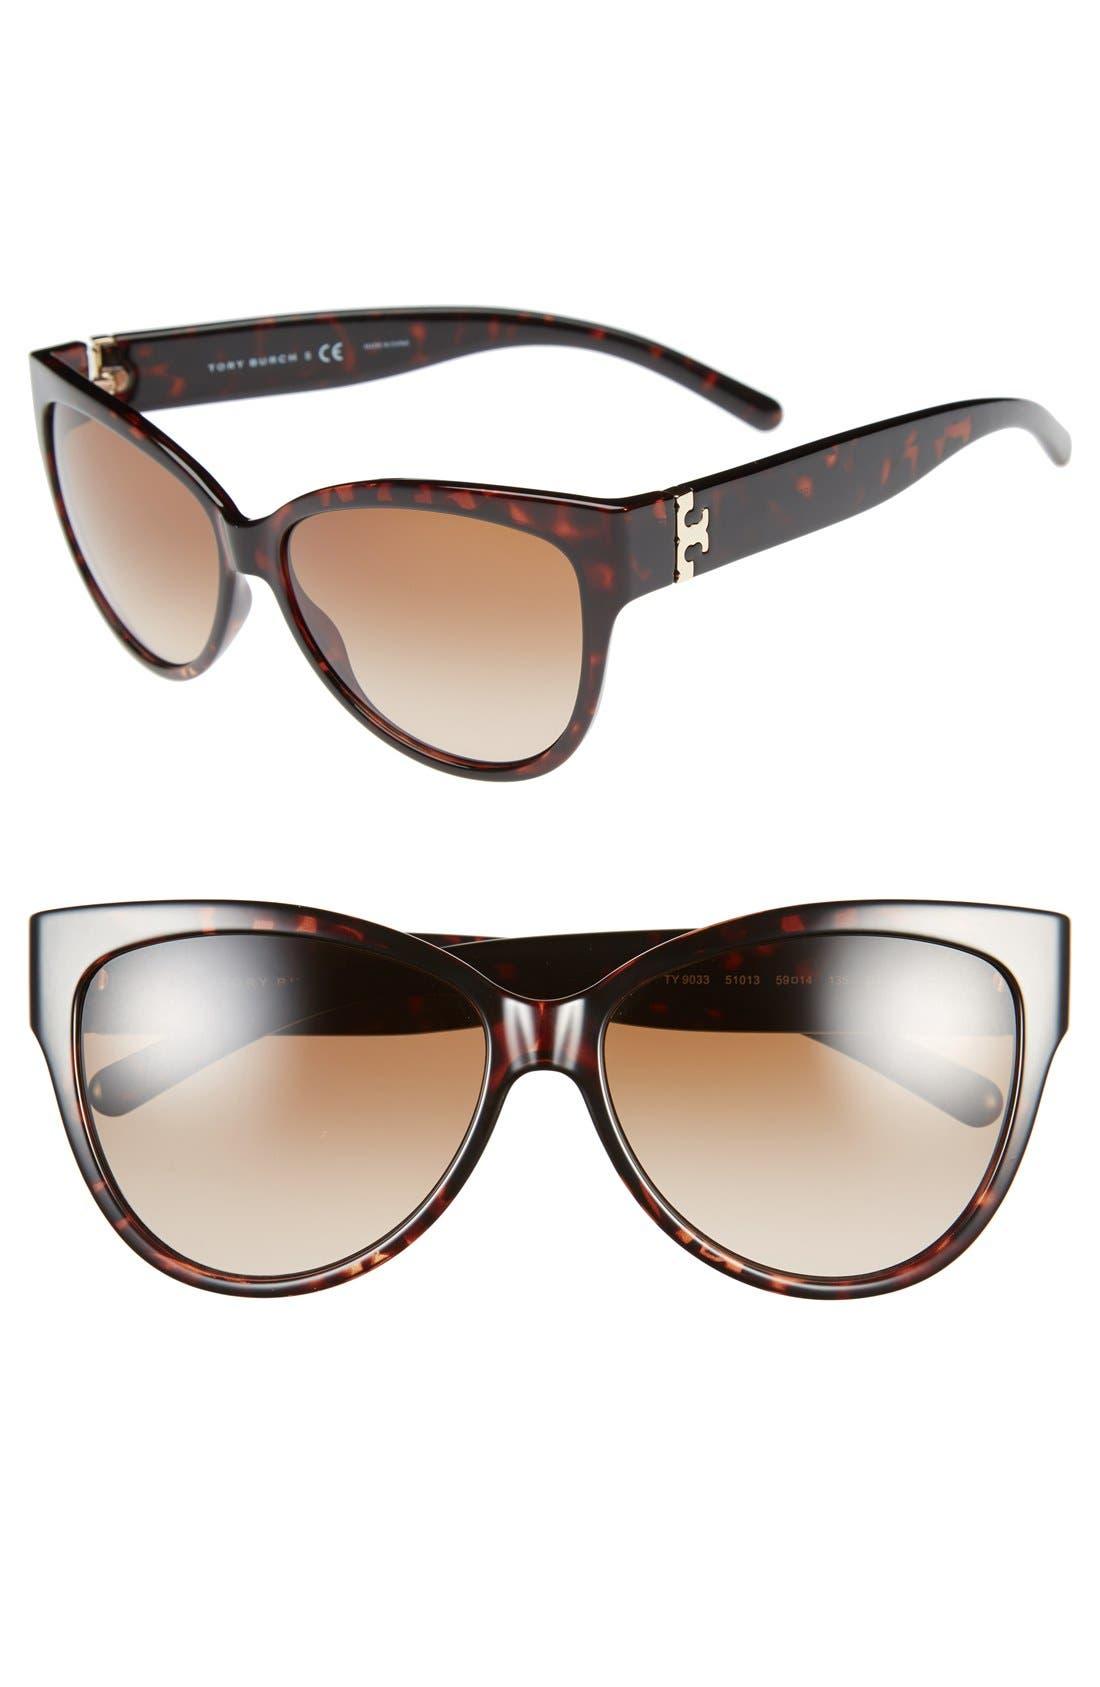 Tory Burch 59mm Cat Eye Sunglasses